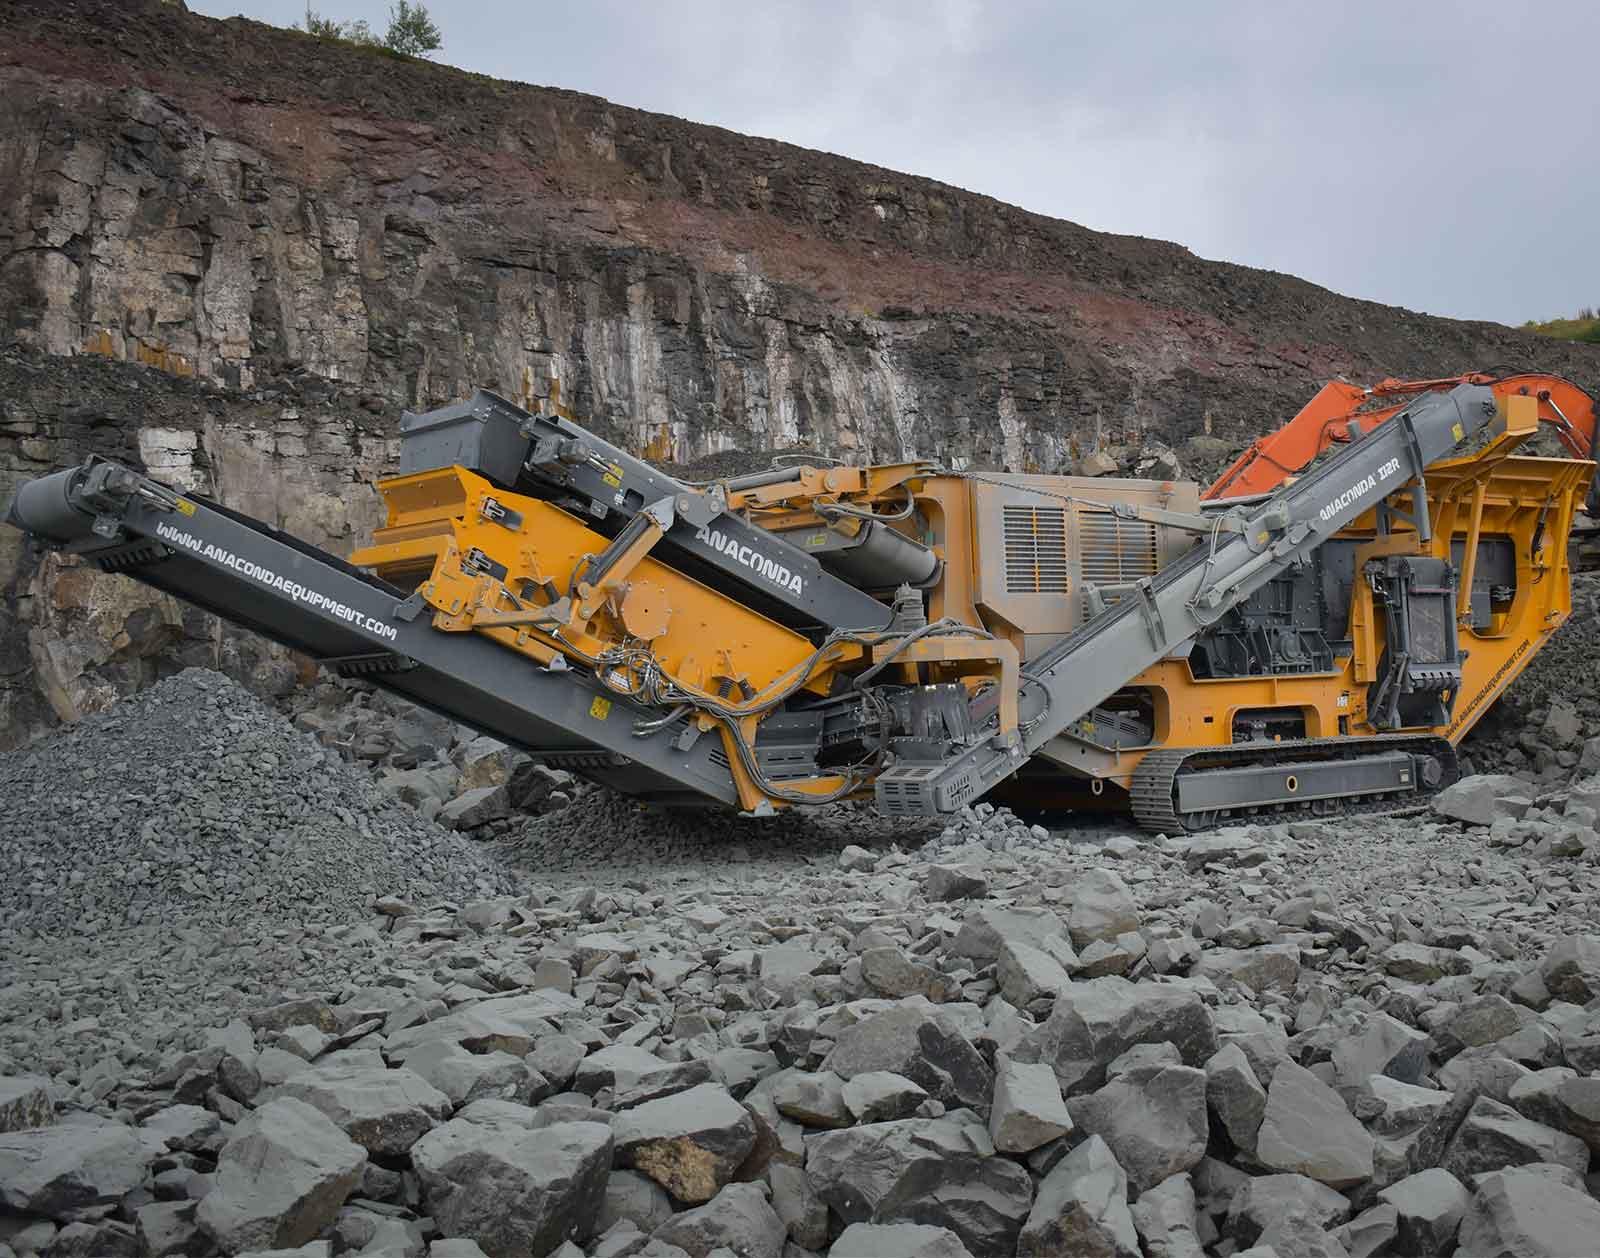 Anaconda I12-R on-site at a rock quarry.